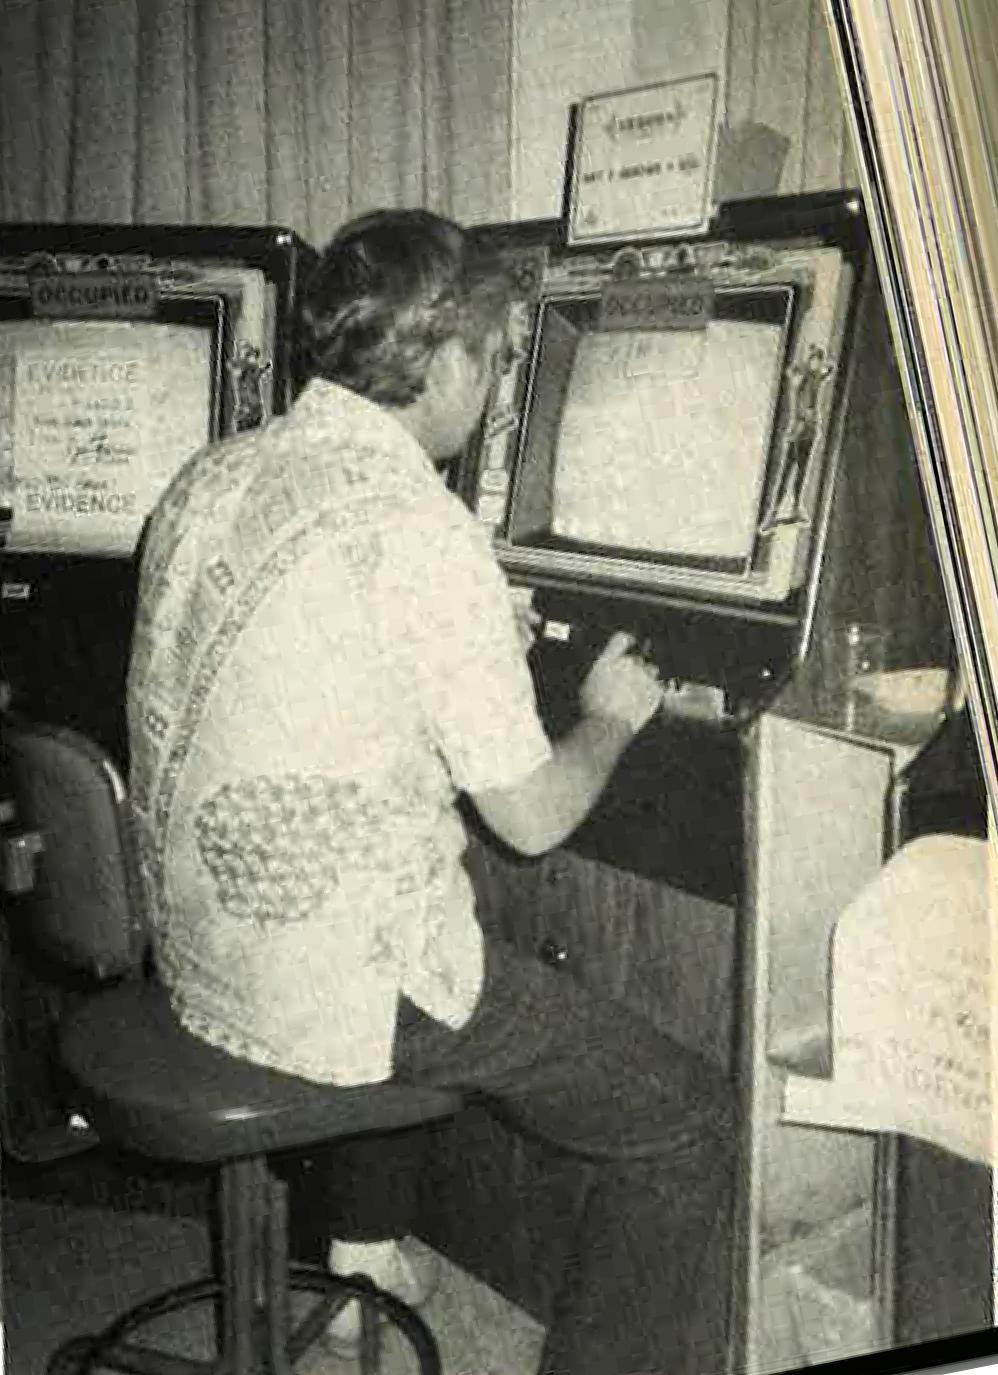 Hn2104 Calabash Fof Gambling April 1986